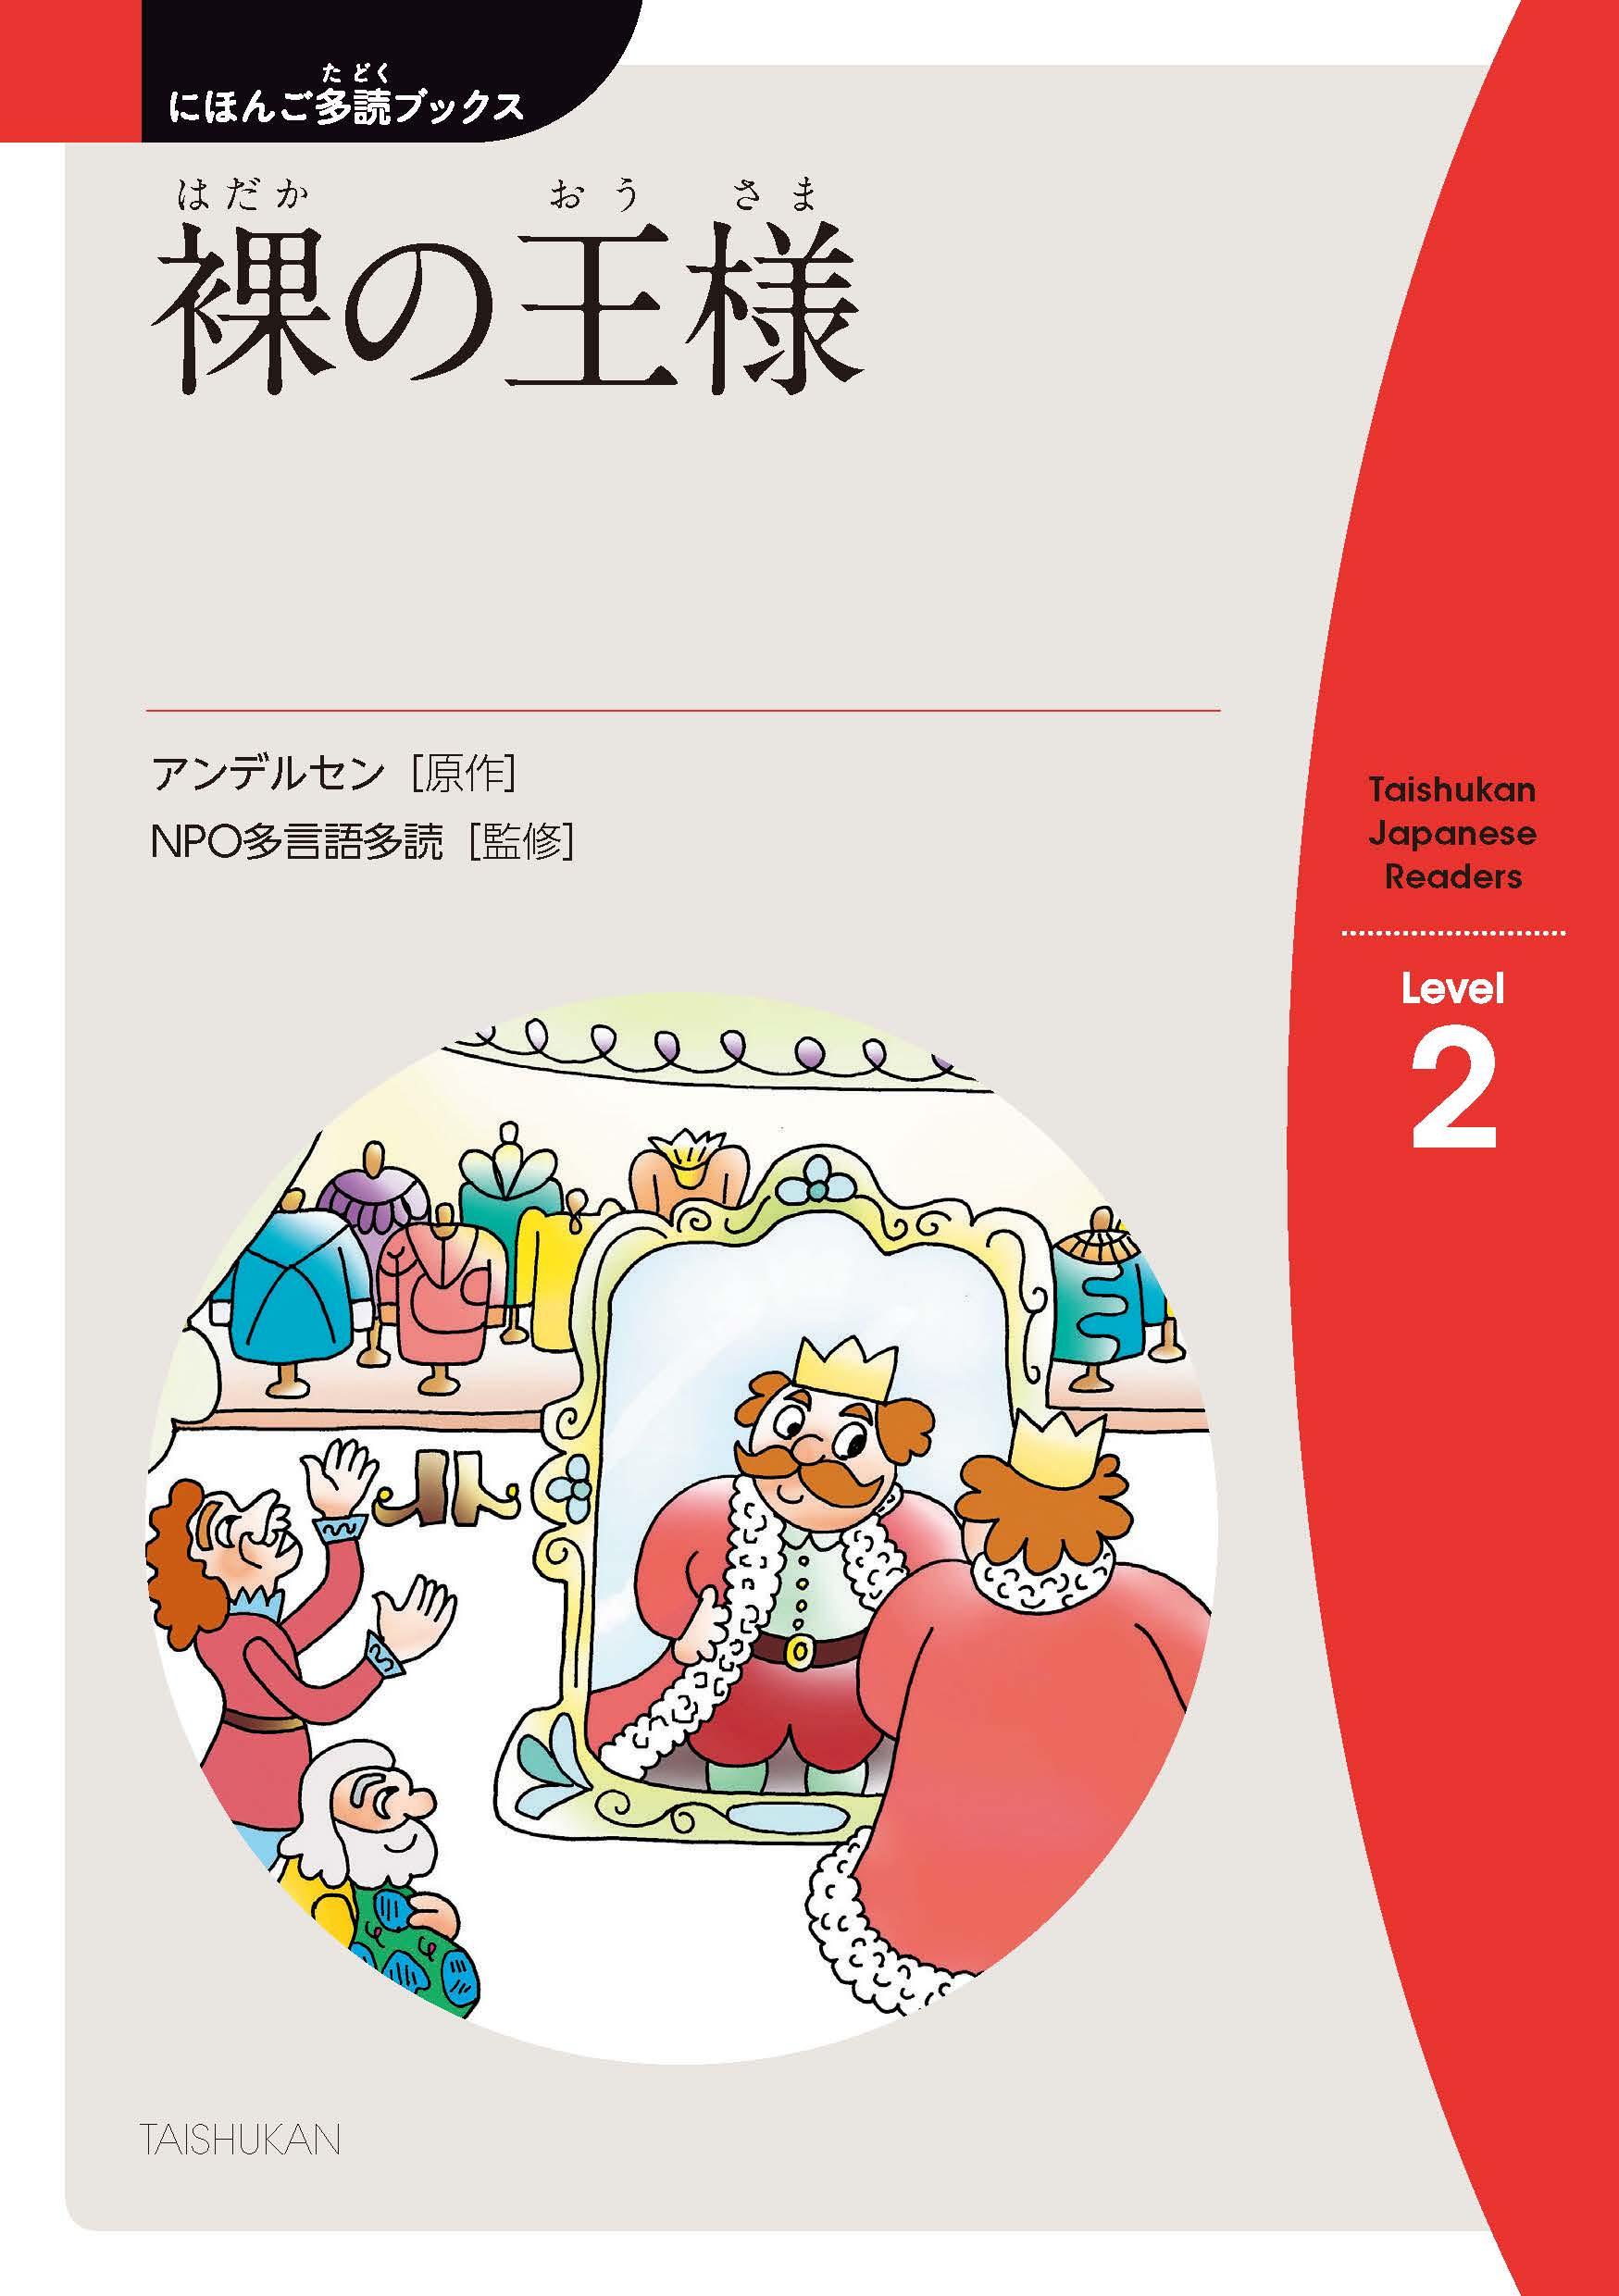 vol.1-6 裸(はだか)の王様(おうさま) Emperor's New Clothes